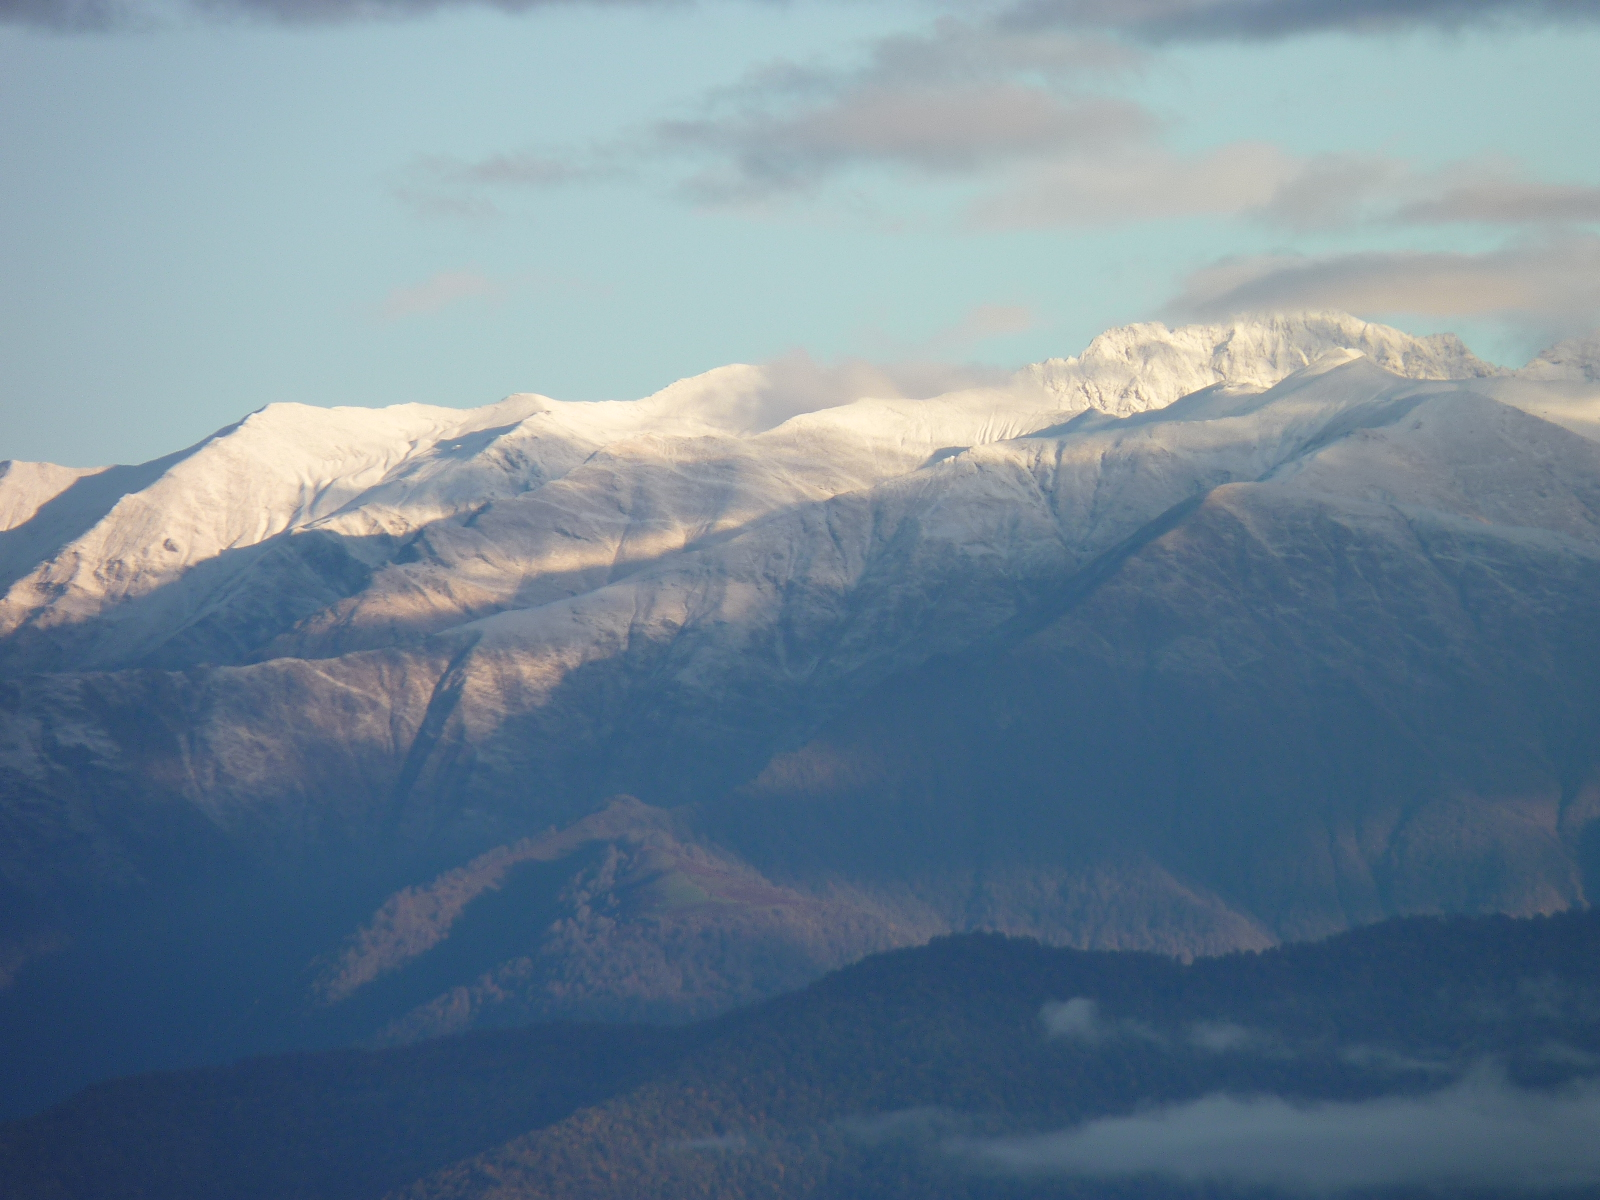 Le Grand Caucase